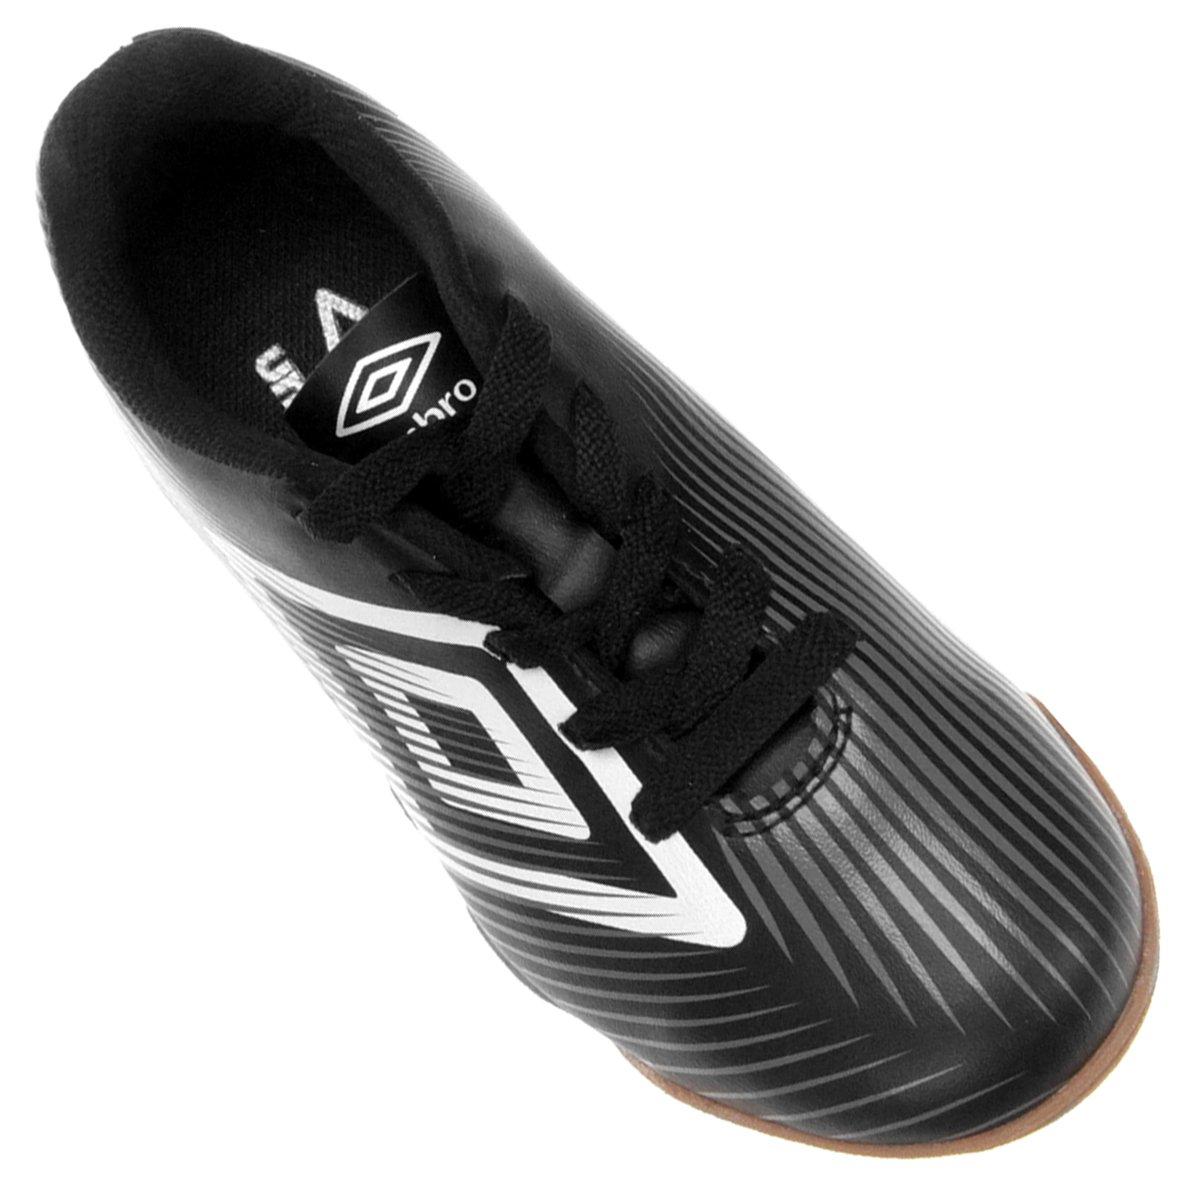 Chuteira Futsal Infantil Umbro Speed II - Preto e Branco - Compre ... f9b0946366adb